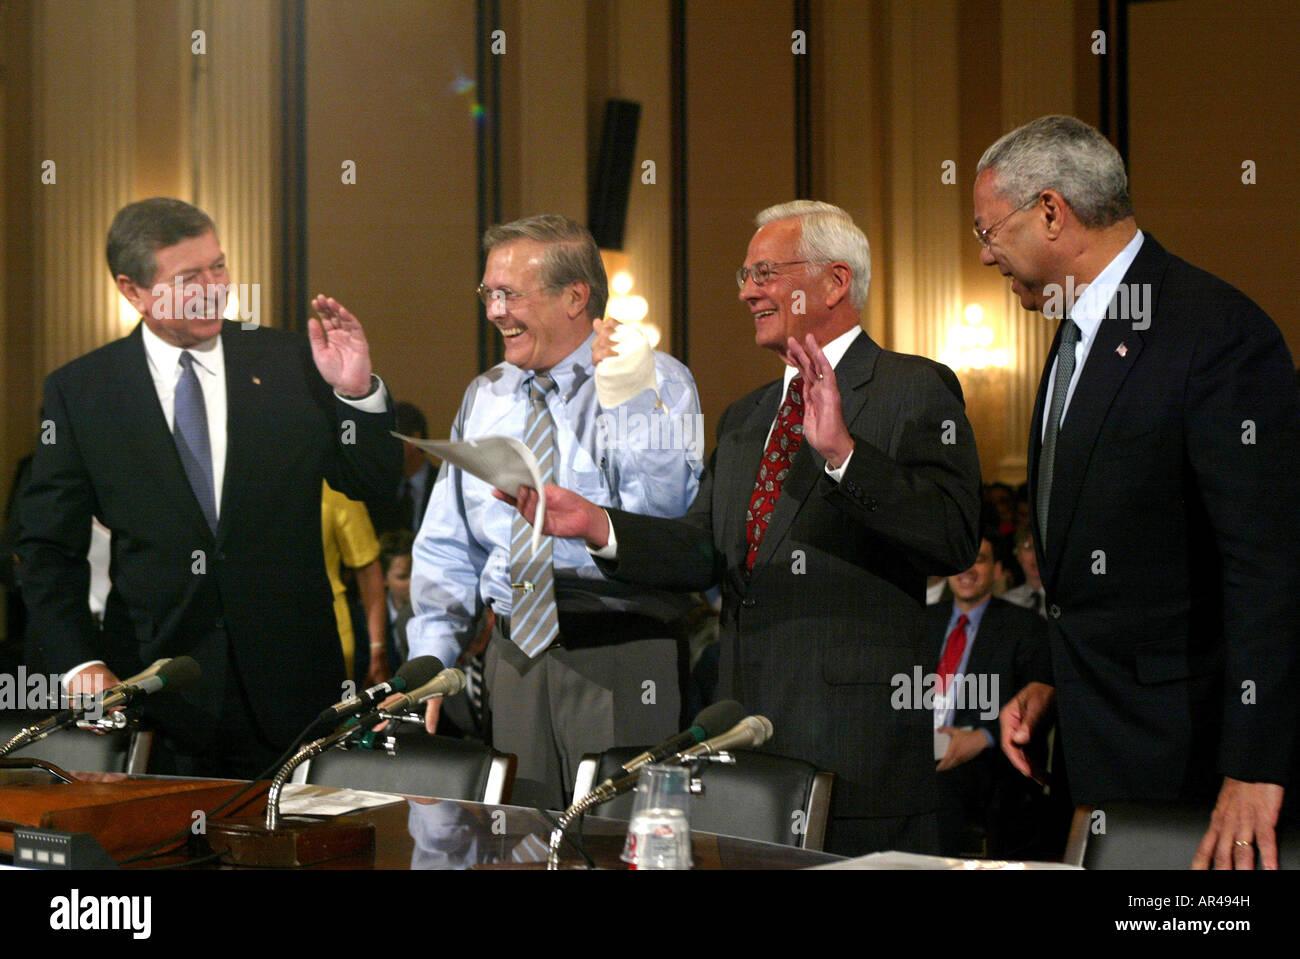 Washington, DC 7/11/02 John Ashcroft, Donald Rumsfeld, Paul H O'Neill, - Stock Image